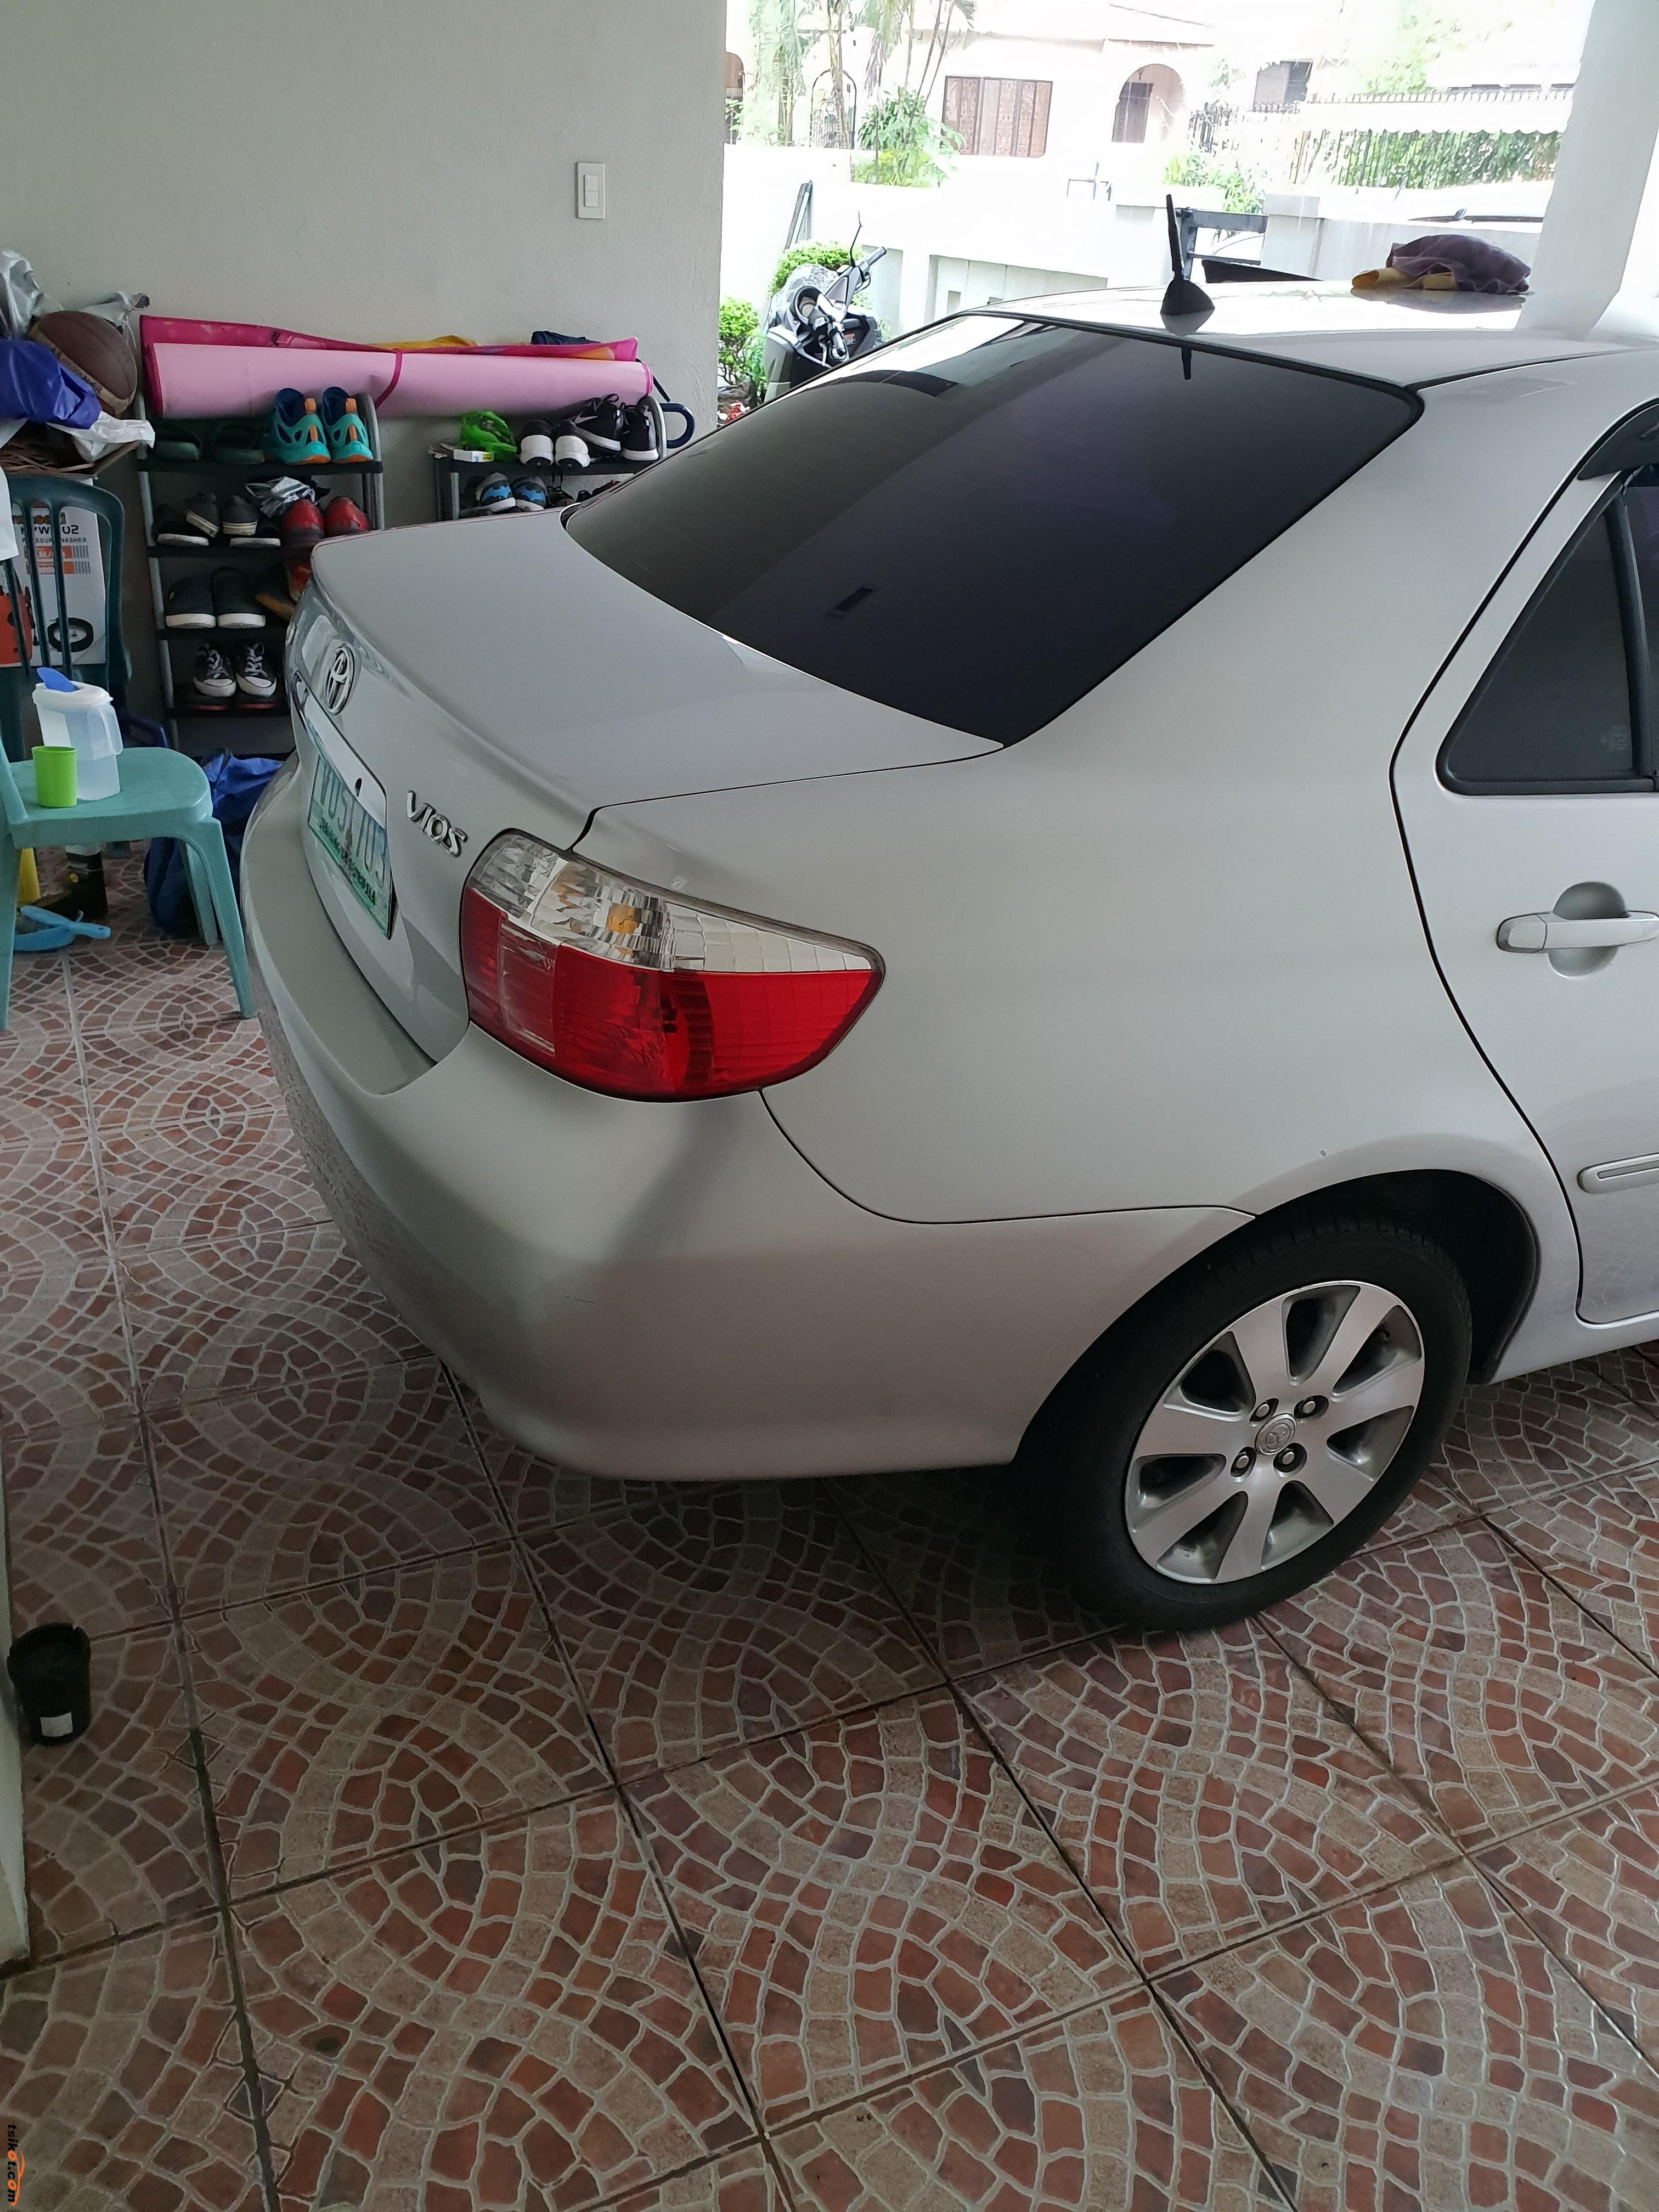 Toyota Vios 2005 - 4